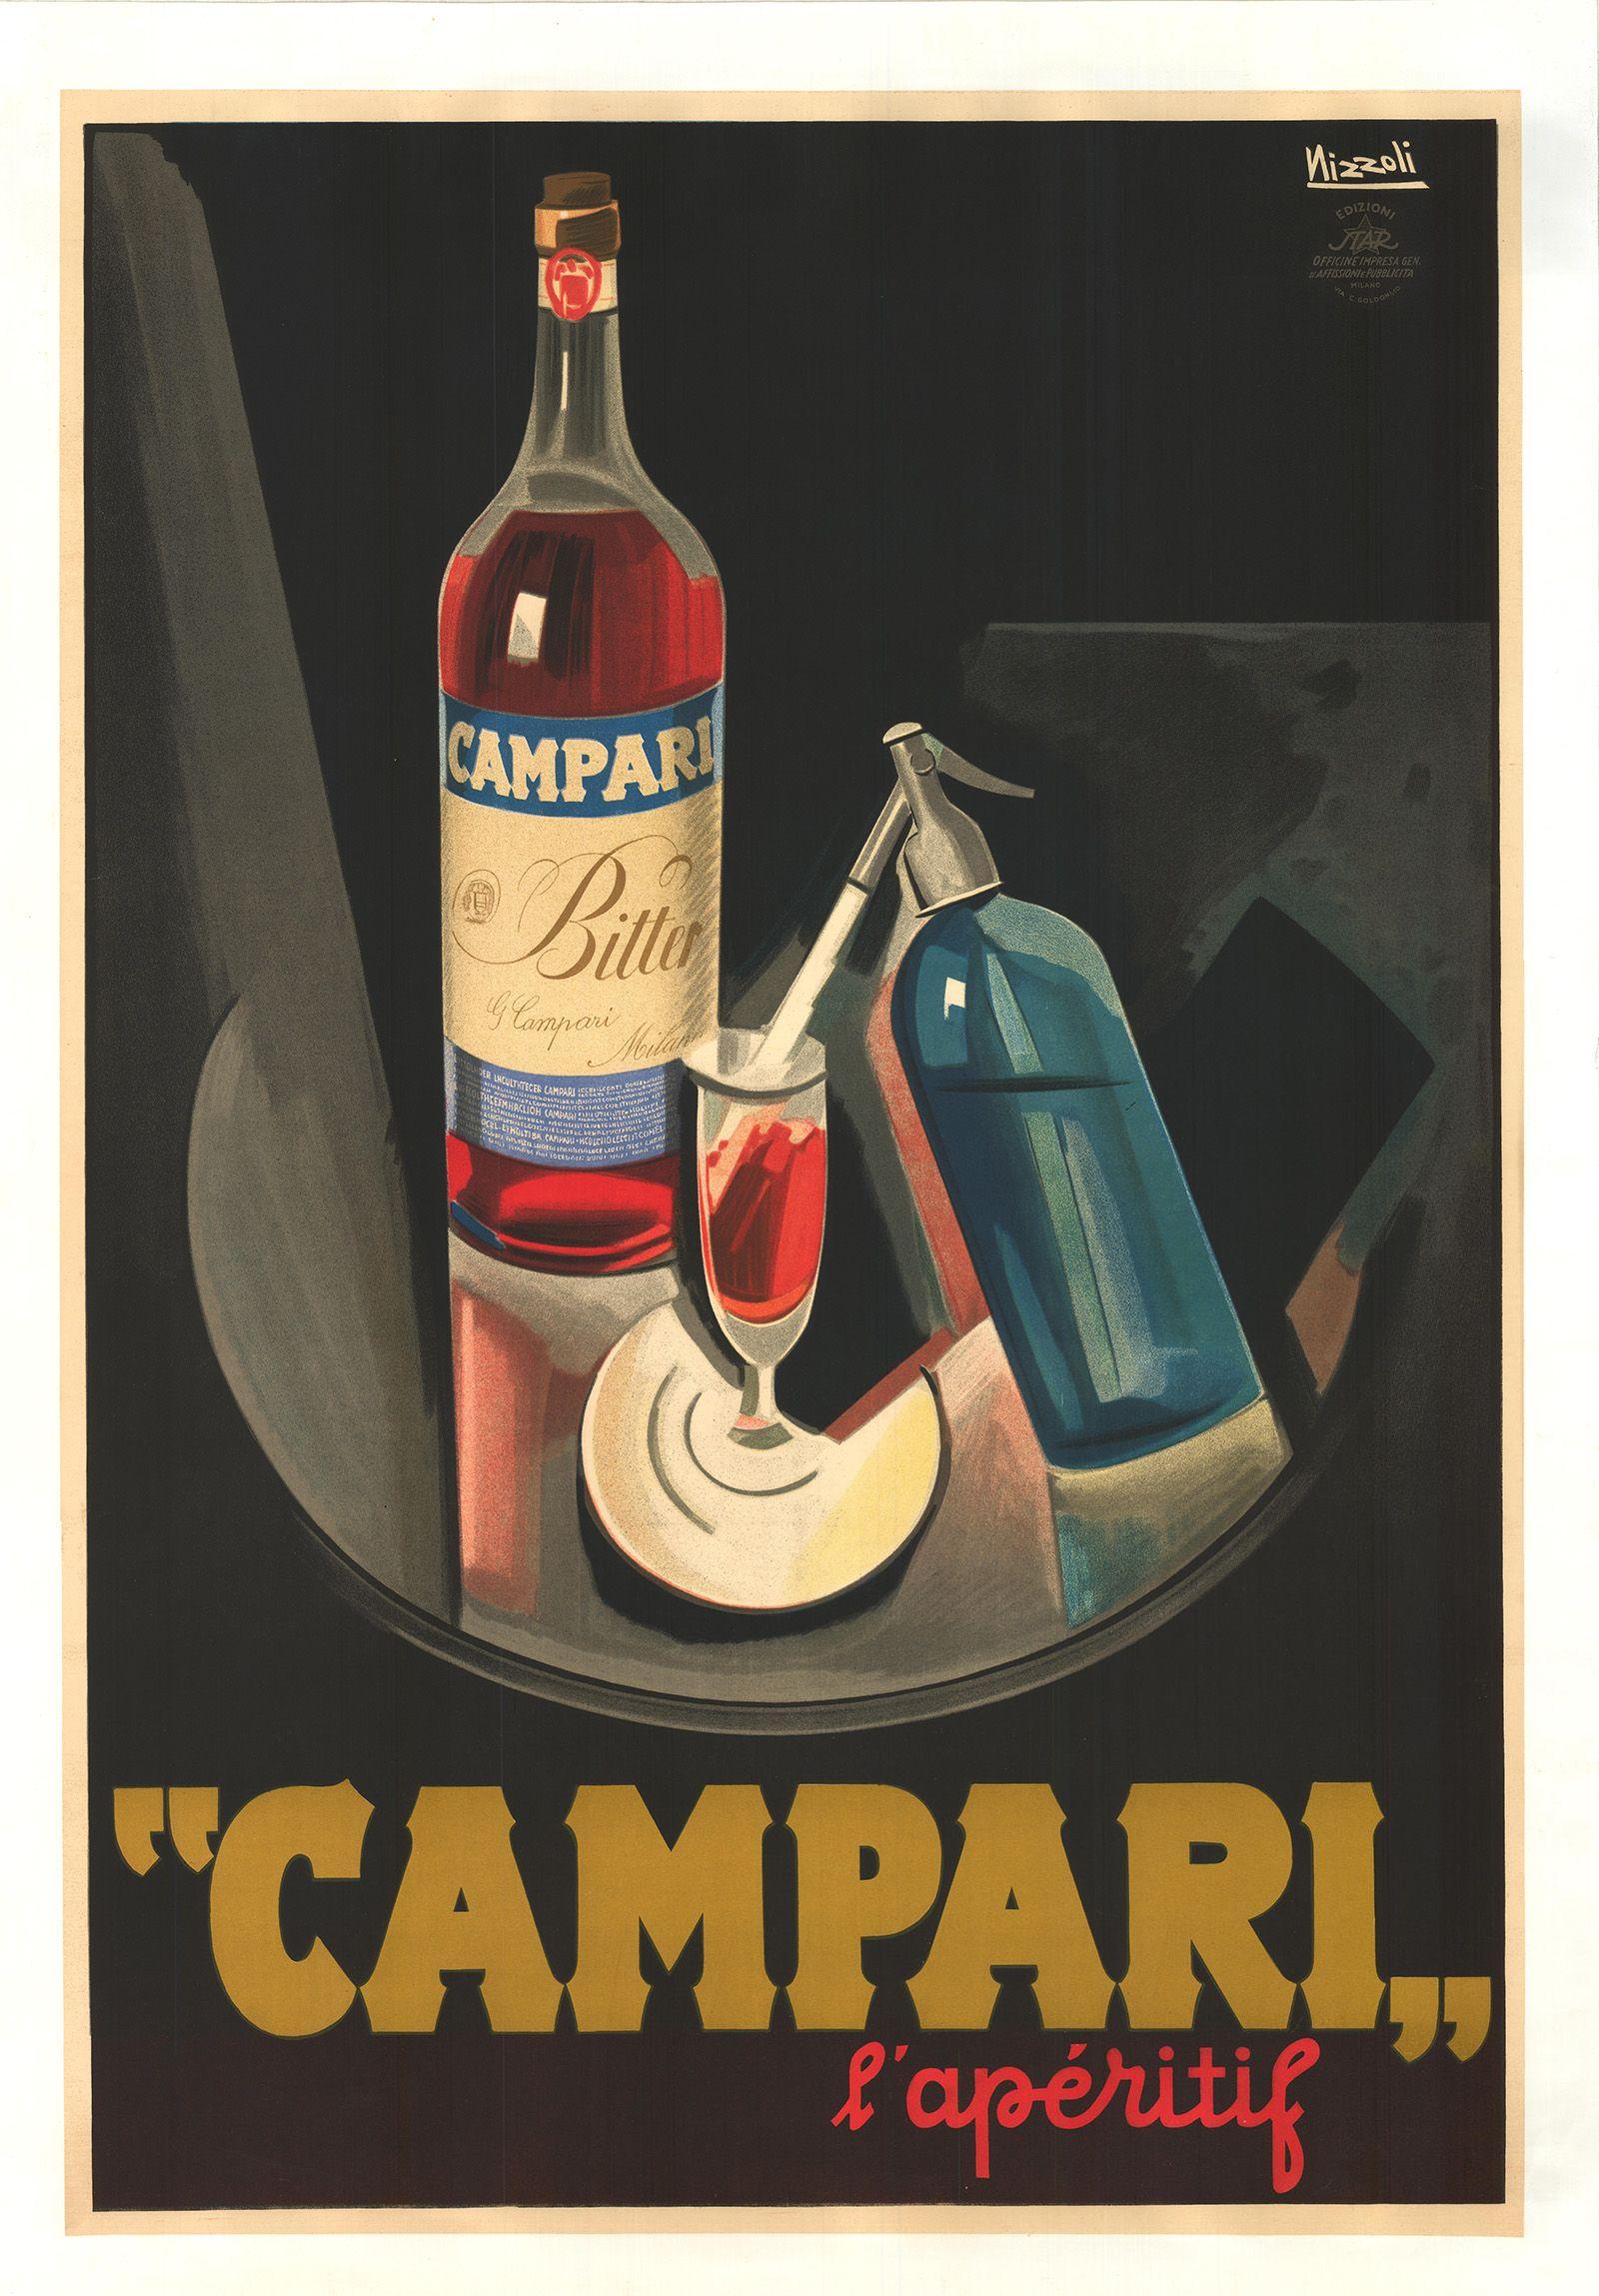 ef157a40d880 Campari L apéritif - vintage poster by Nizzoli Affiches Marci Collection